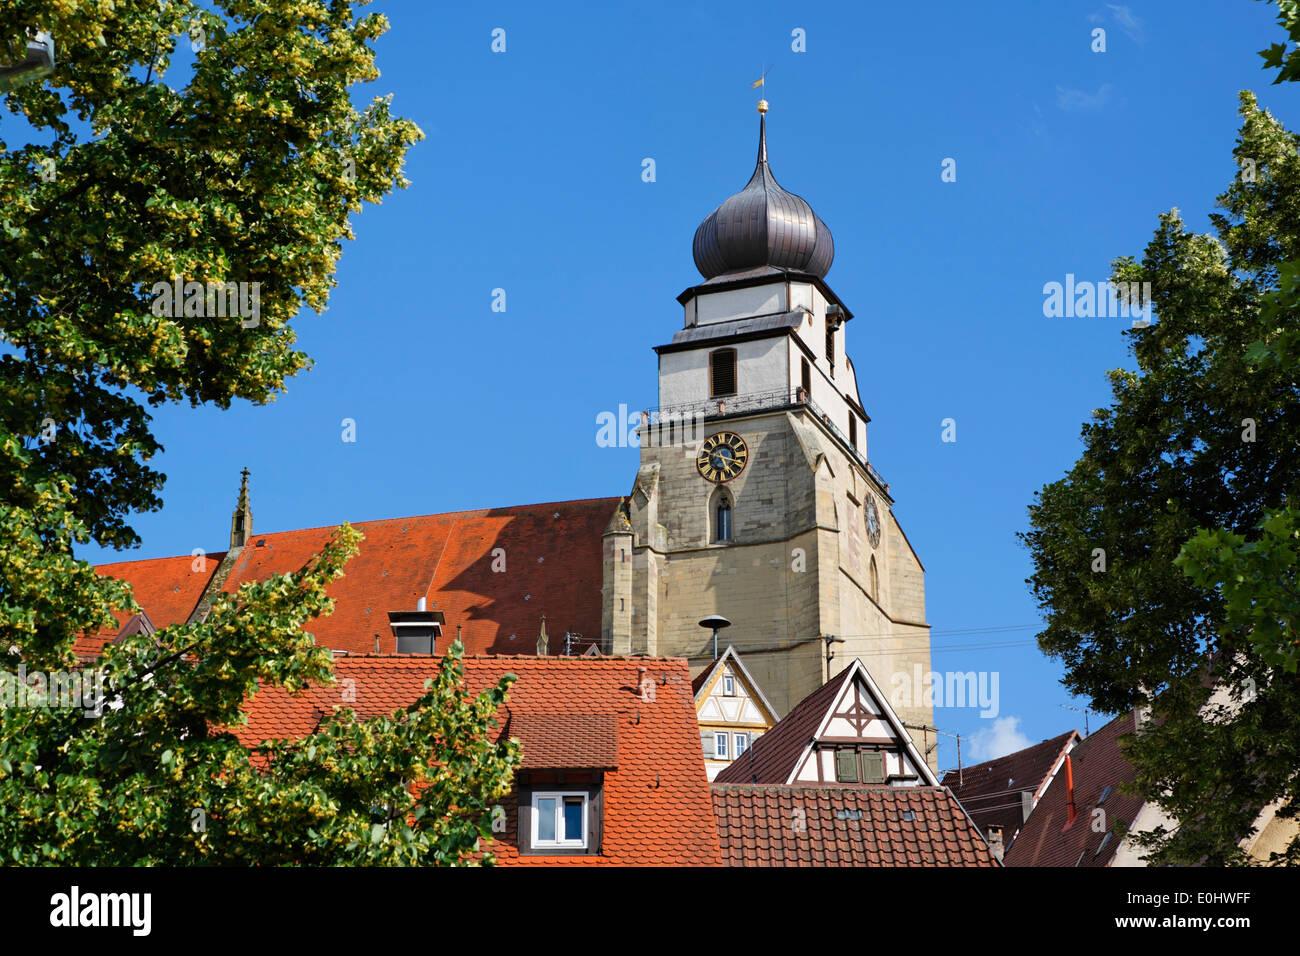 Germany, collegiate church, houses, gable, Deutschland, Baden-Württemberg, Herrenberg, Stiftskirche, Häuser, Giebel - Stock Image